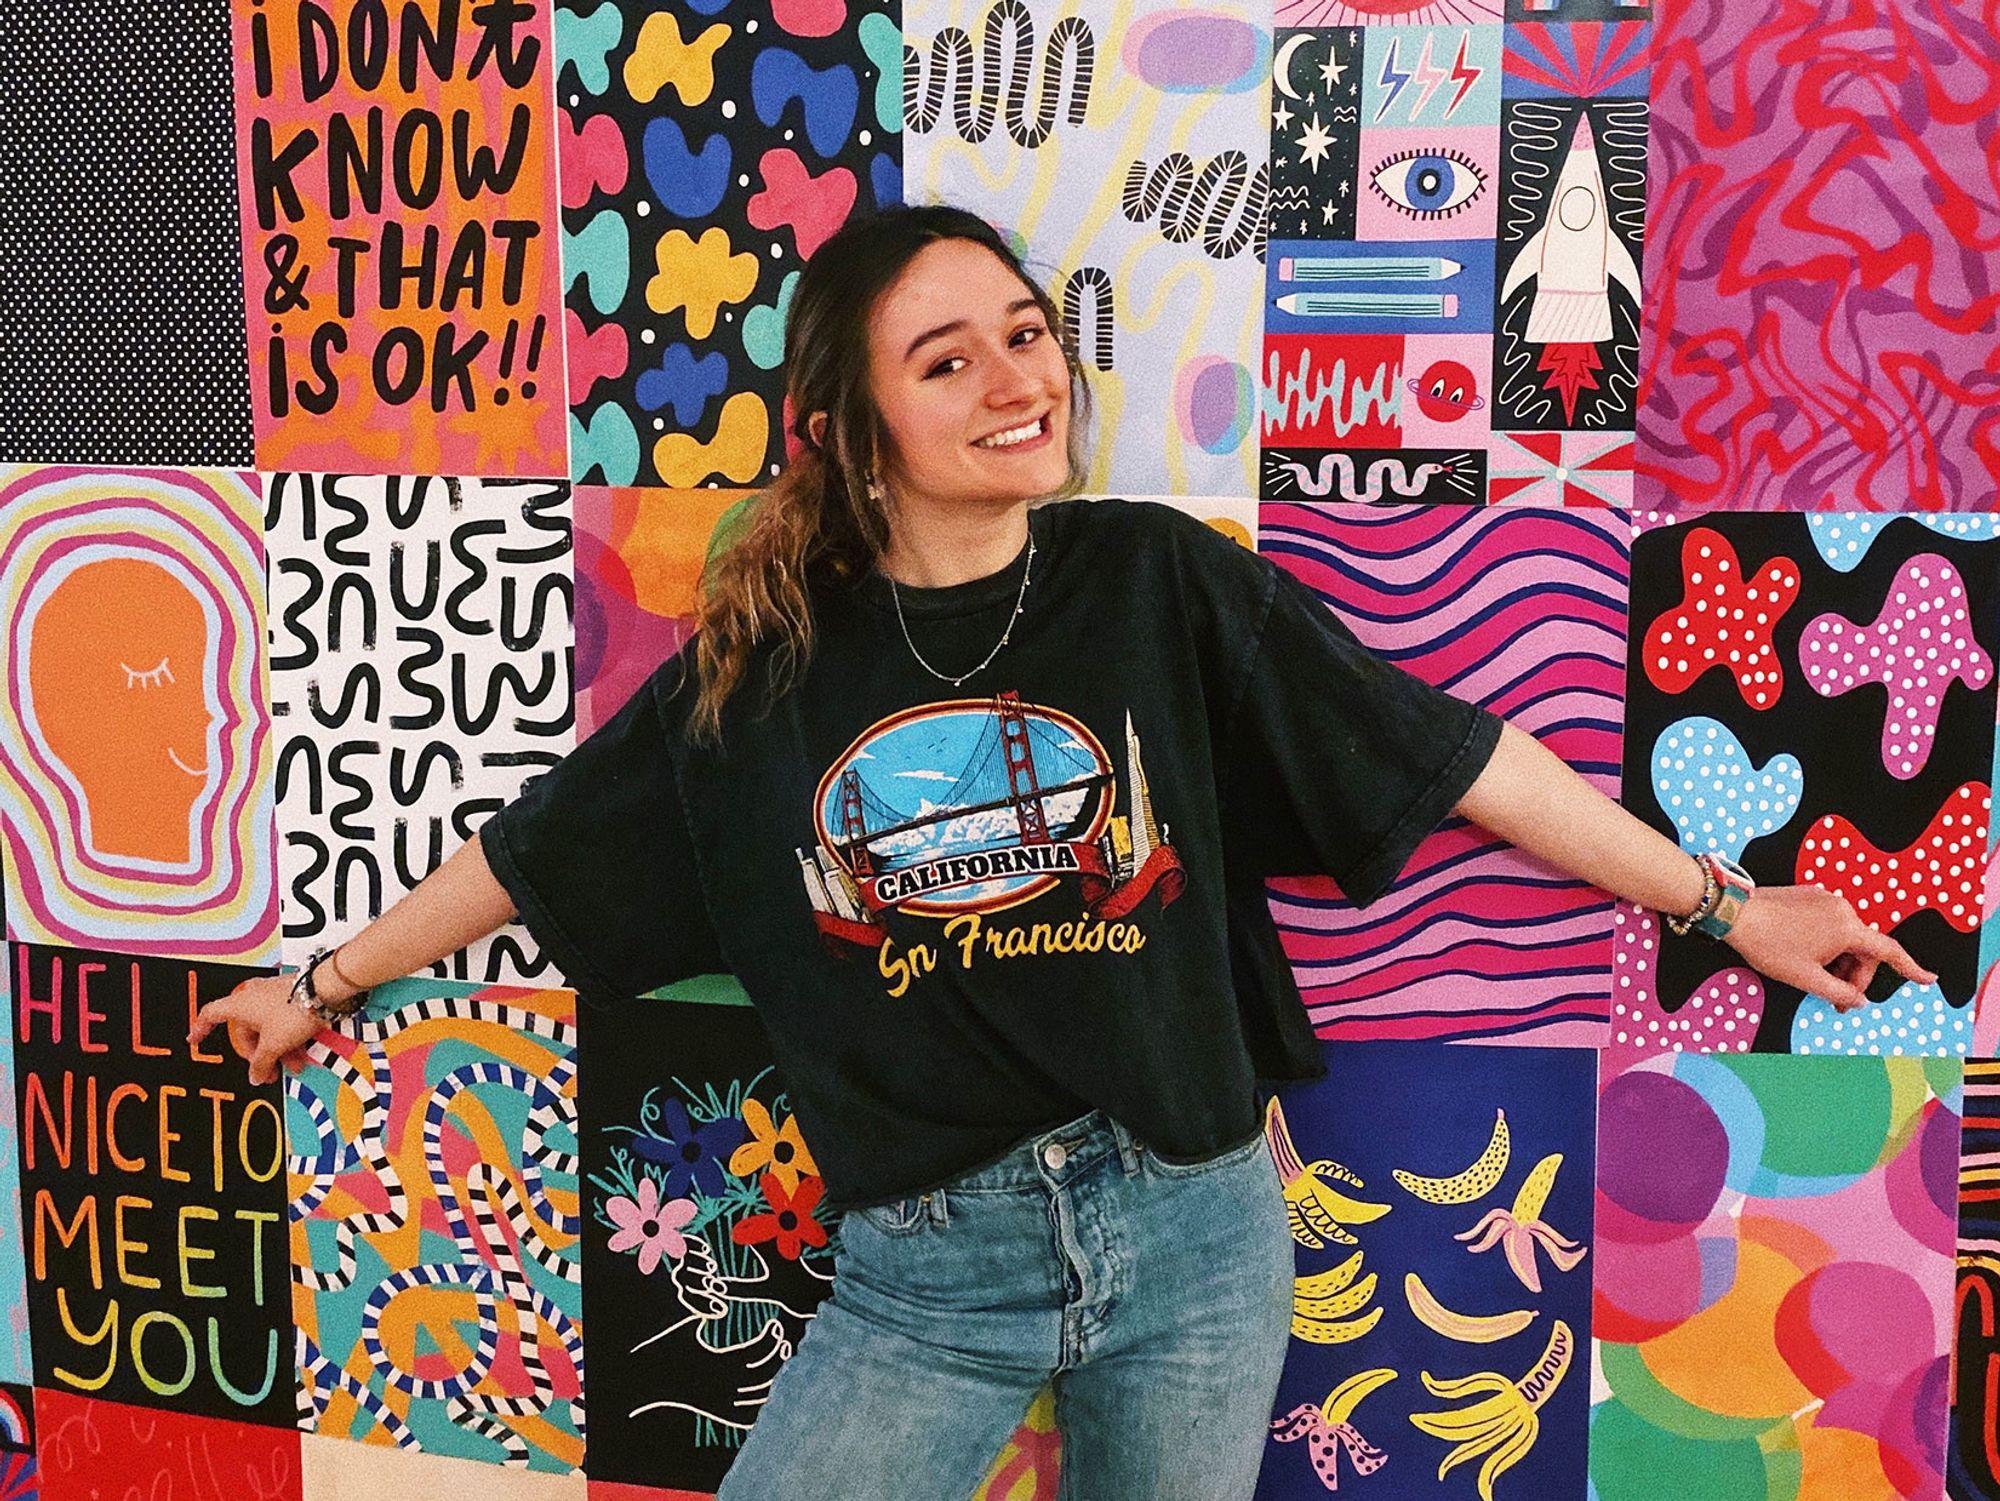 Illustrator + Activist Grace Owen on Using Art to Drive Social Change